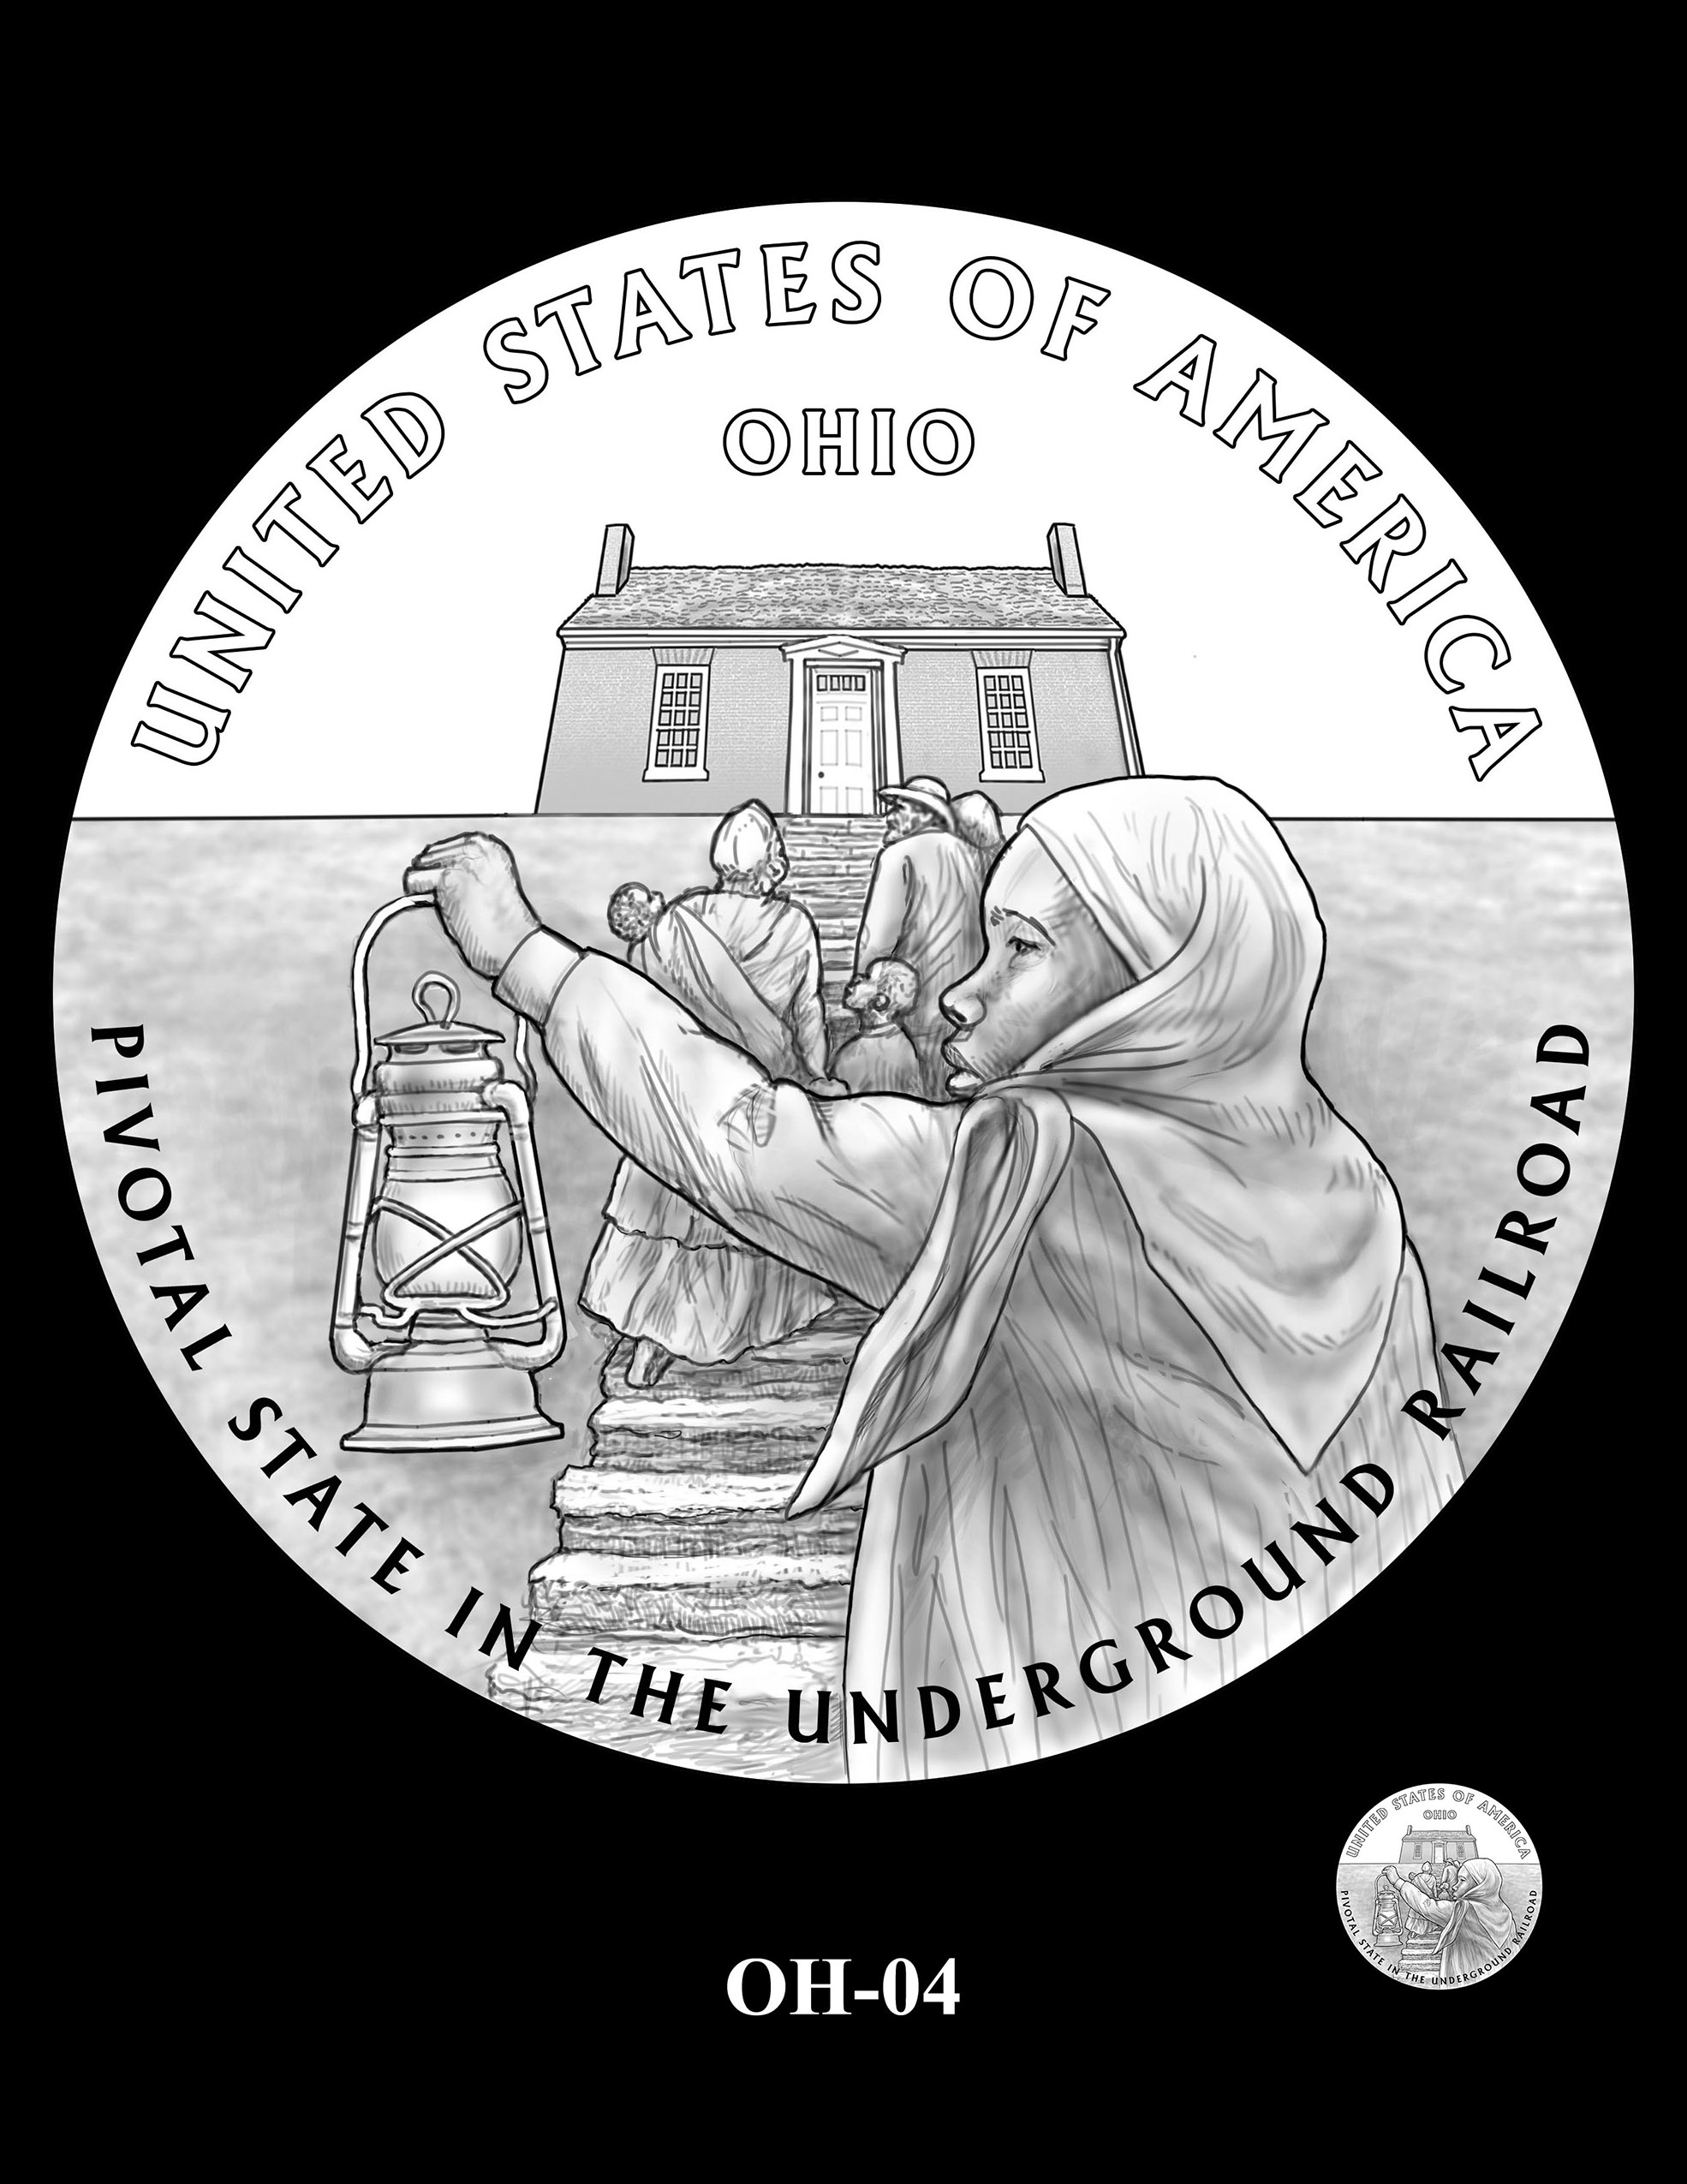 OH-04 -- 2023 American Innovation $1 Coin Program - Ohio